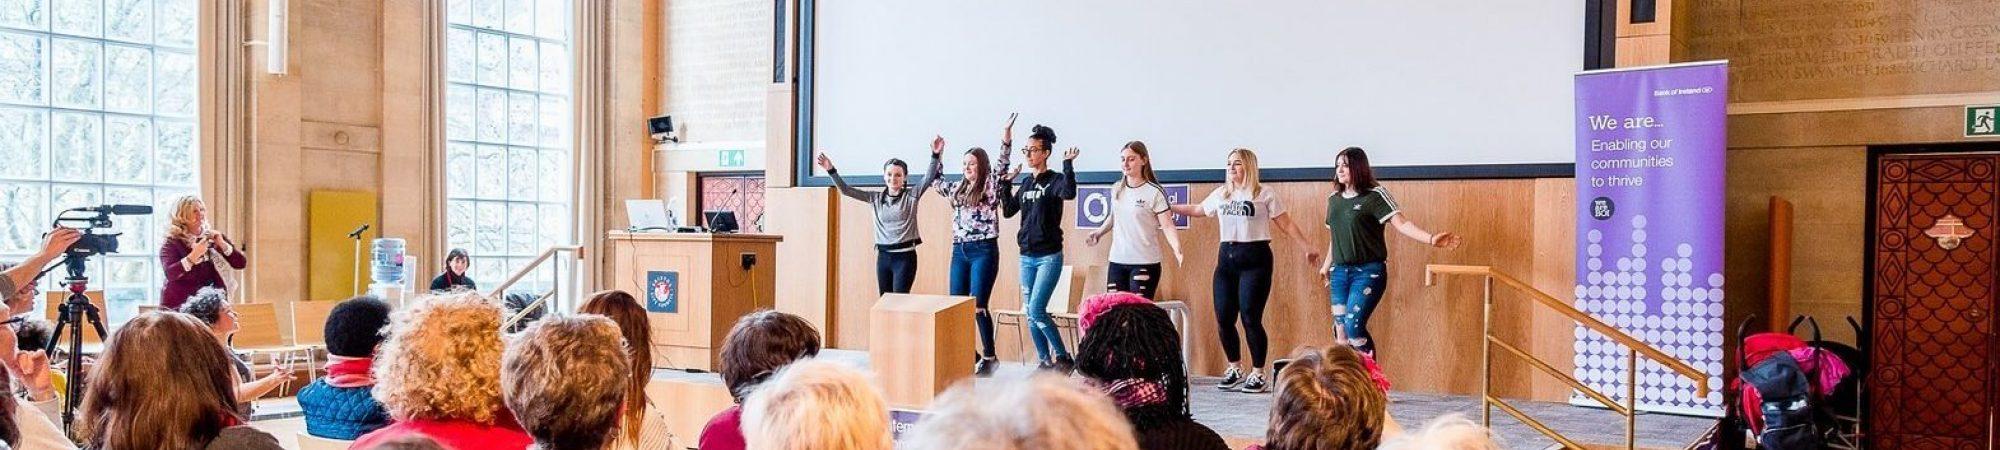 Merchants academy girls performing at iwd 2019 1